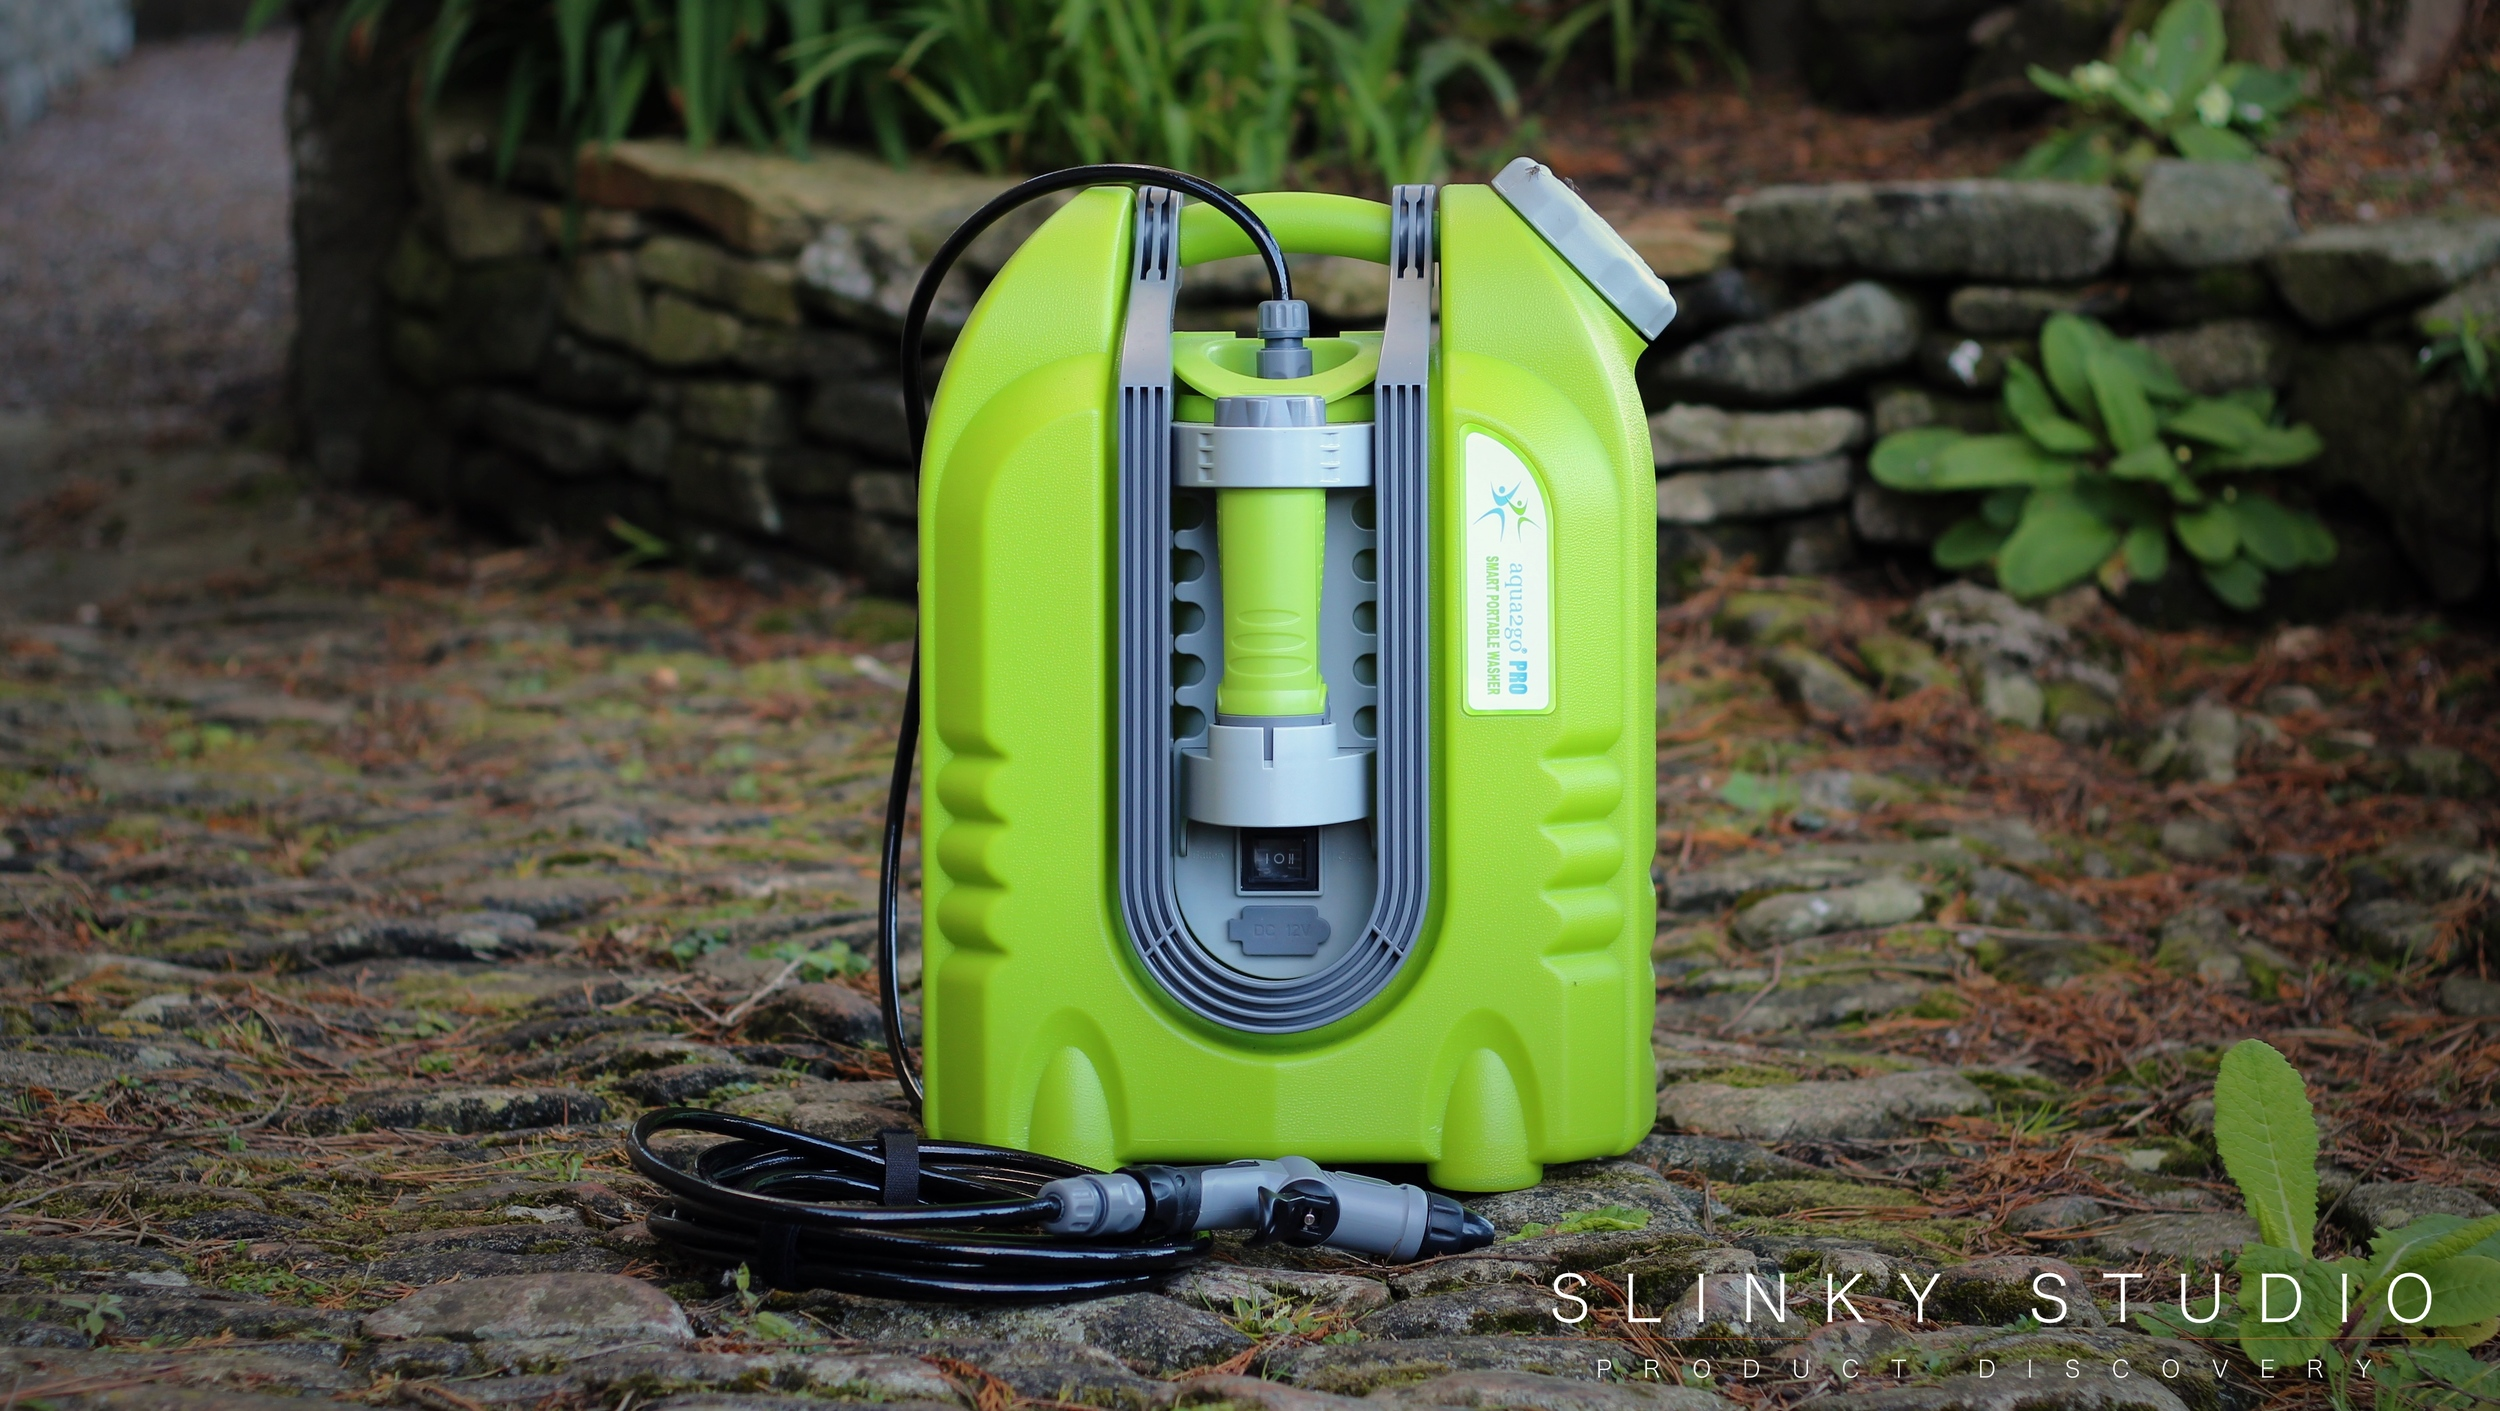 Aqua2Go Pro Smart Pressure Washer